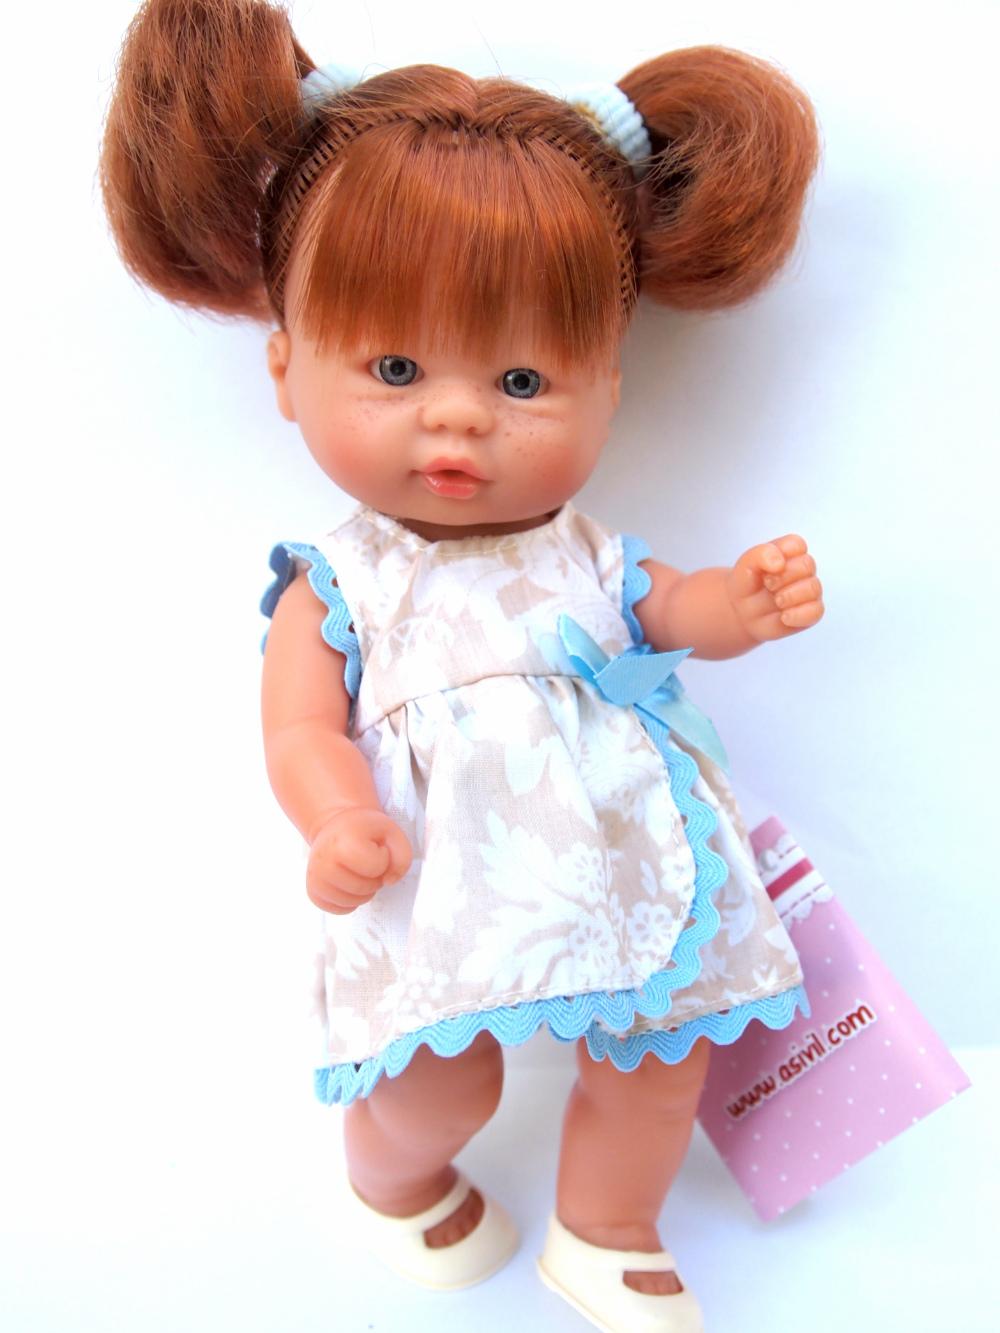 Кукла – Пупсик с веснушками, 20 смКуклы ASI (Испания)<br>Кукла – Пупсик с веснушками, 20 см<br>